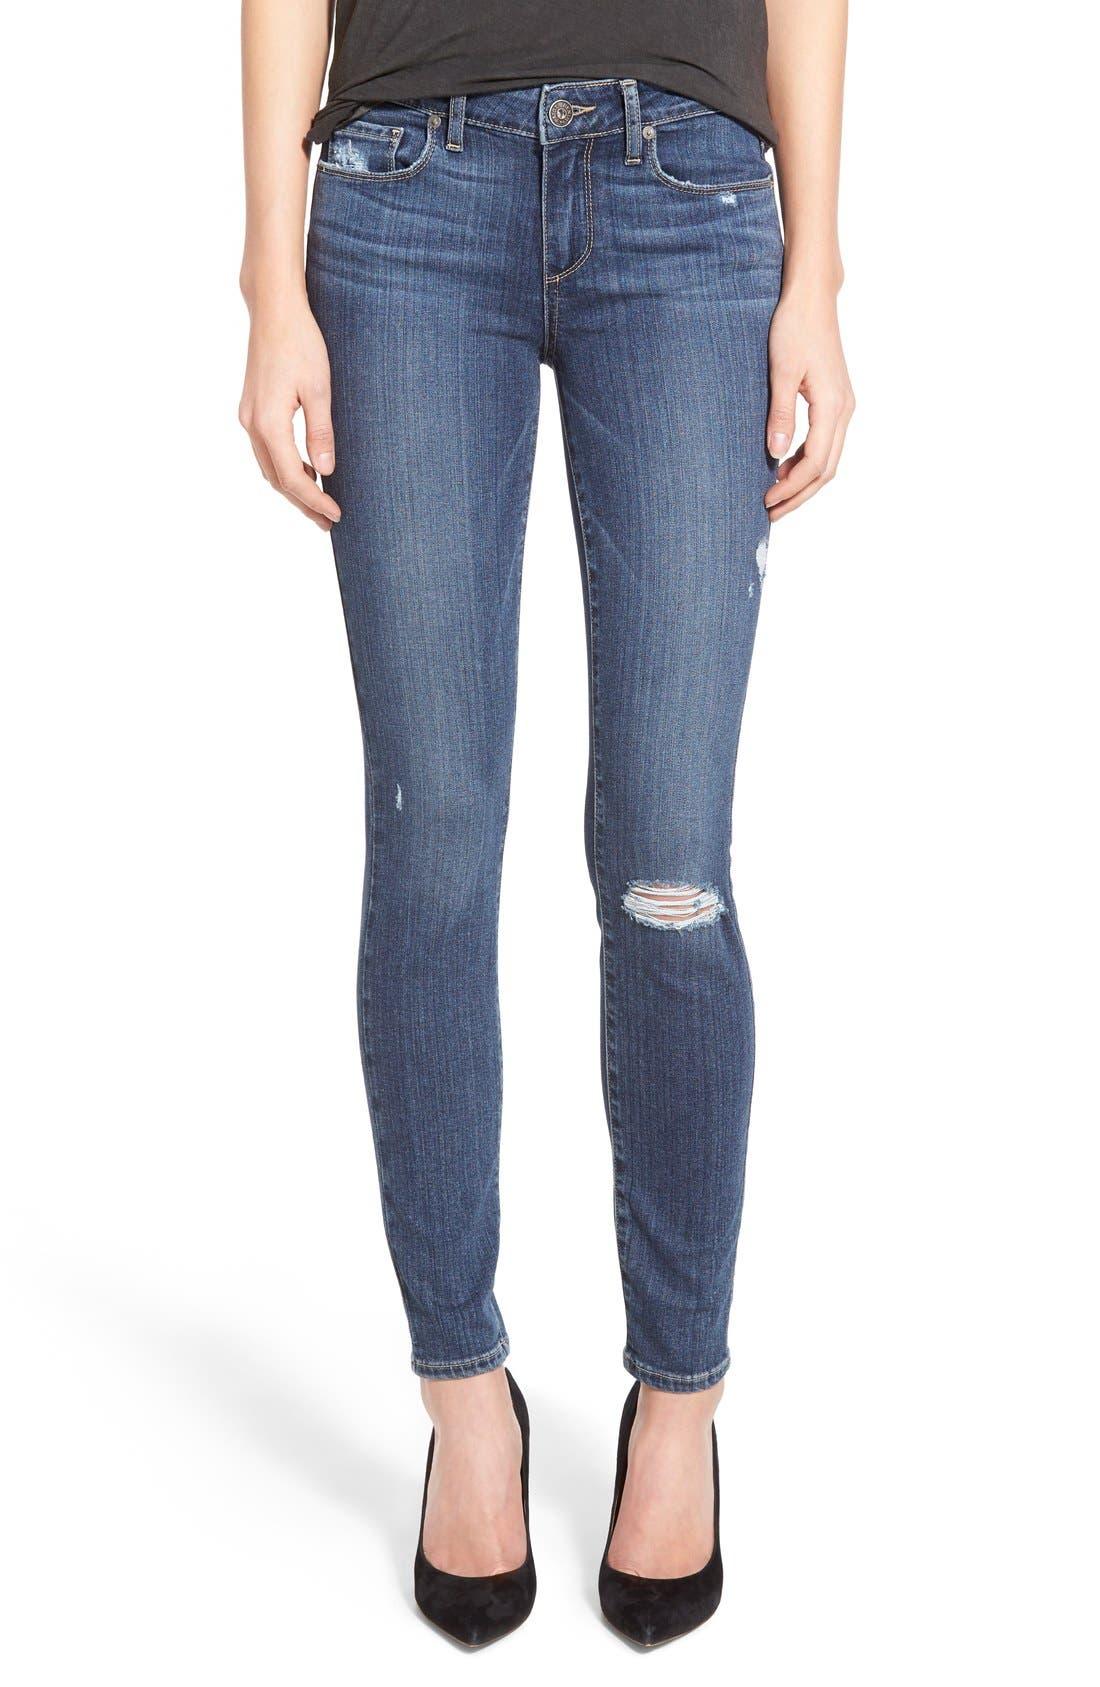 Main Image - Paige Denim 'Transcend - Verdugo' Ultra Skinny Jeans (Silas Destructed)